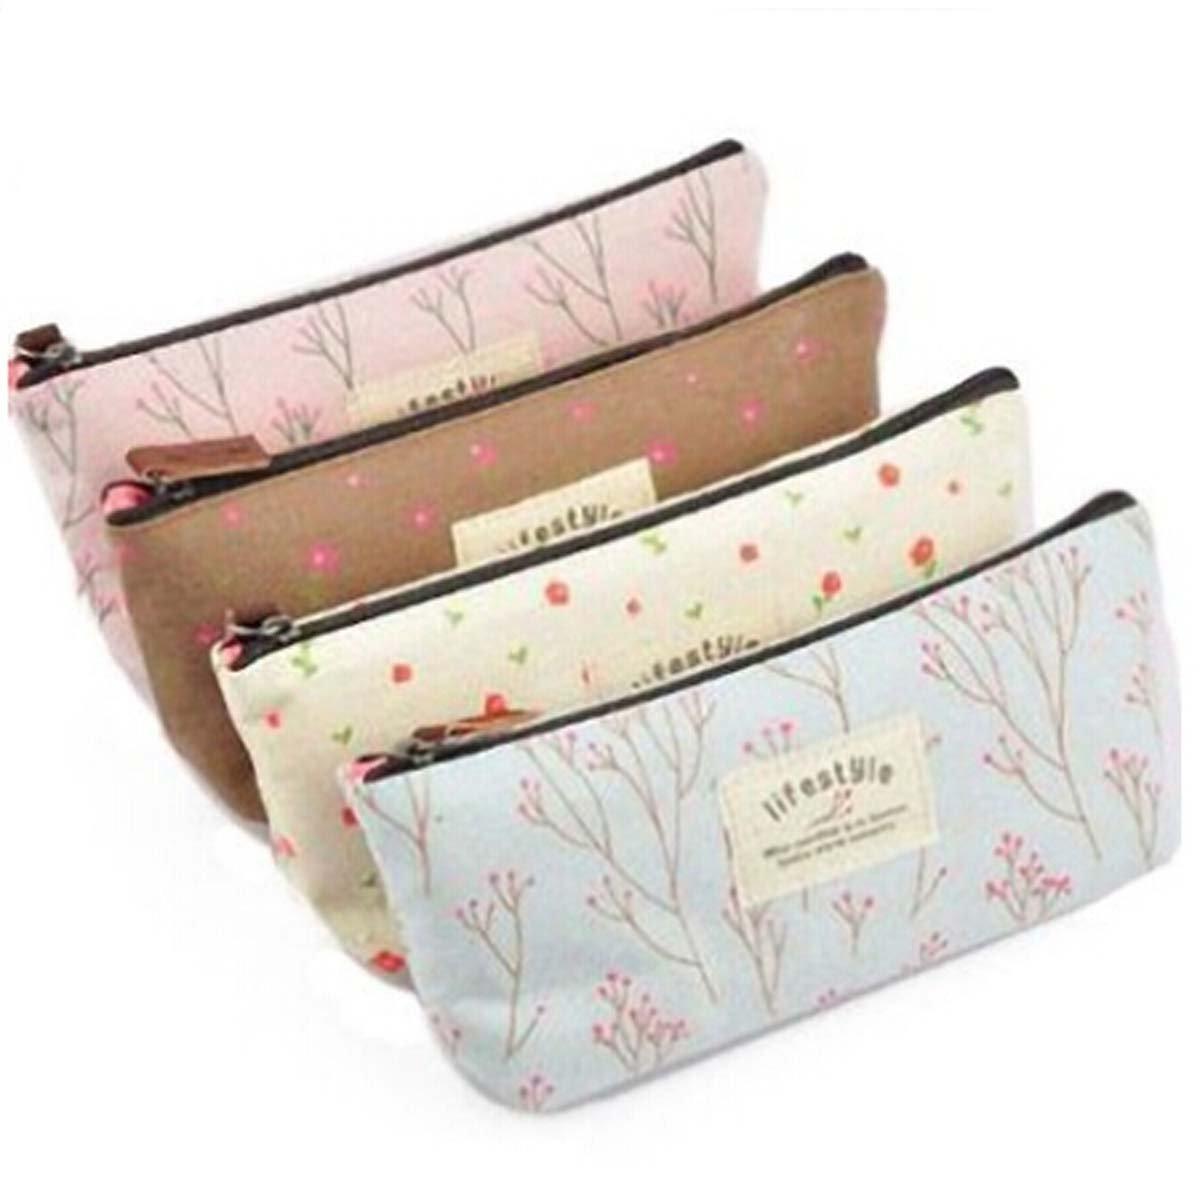 SODIAL(R) Pastoral Canvas Pen Bag , Brand New, Different Colors,set of 4